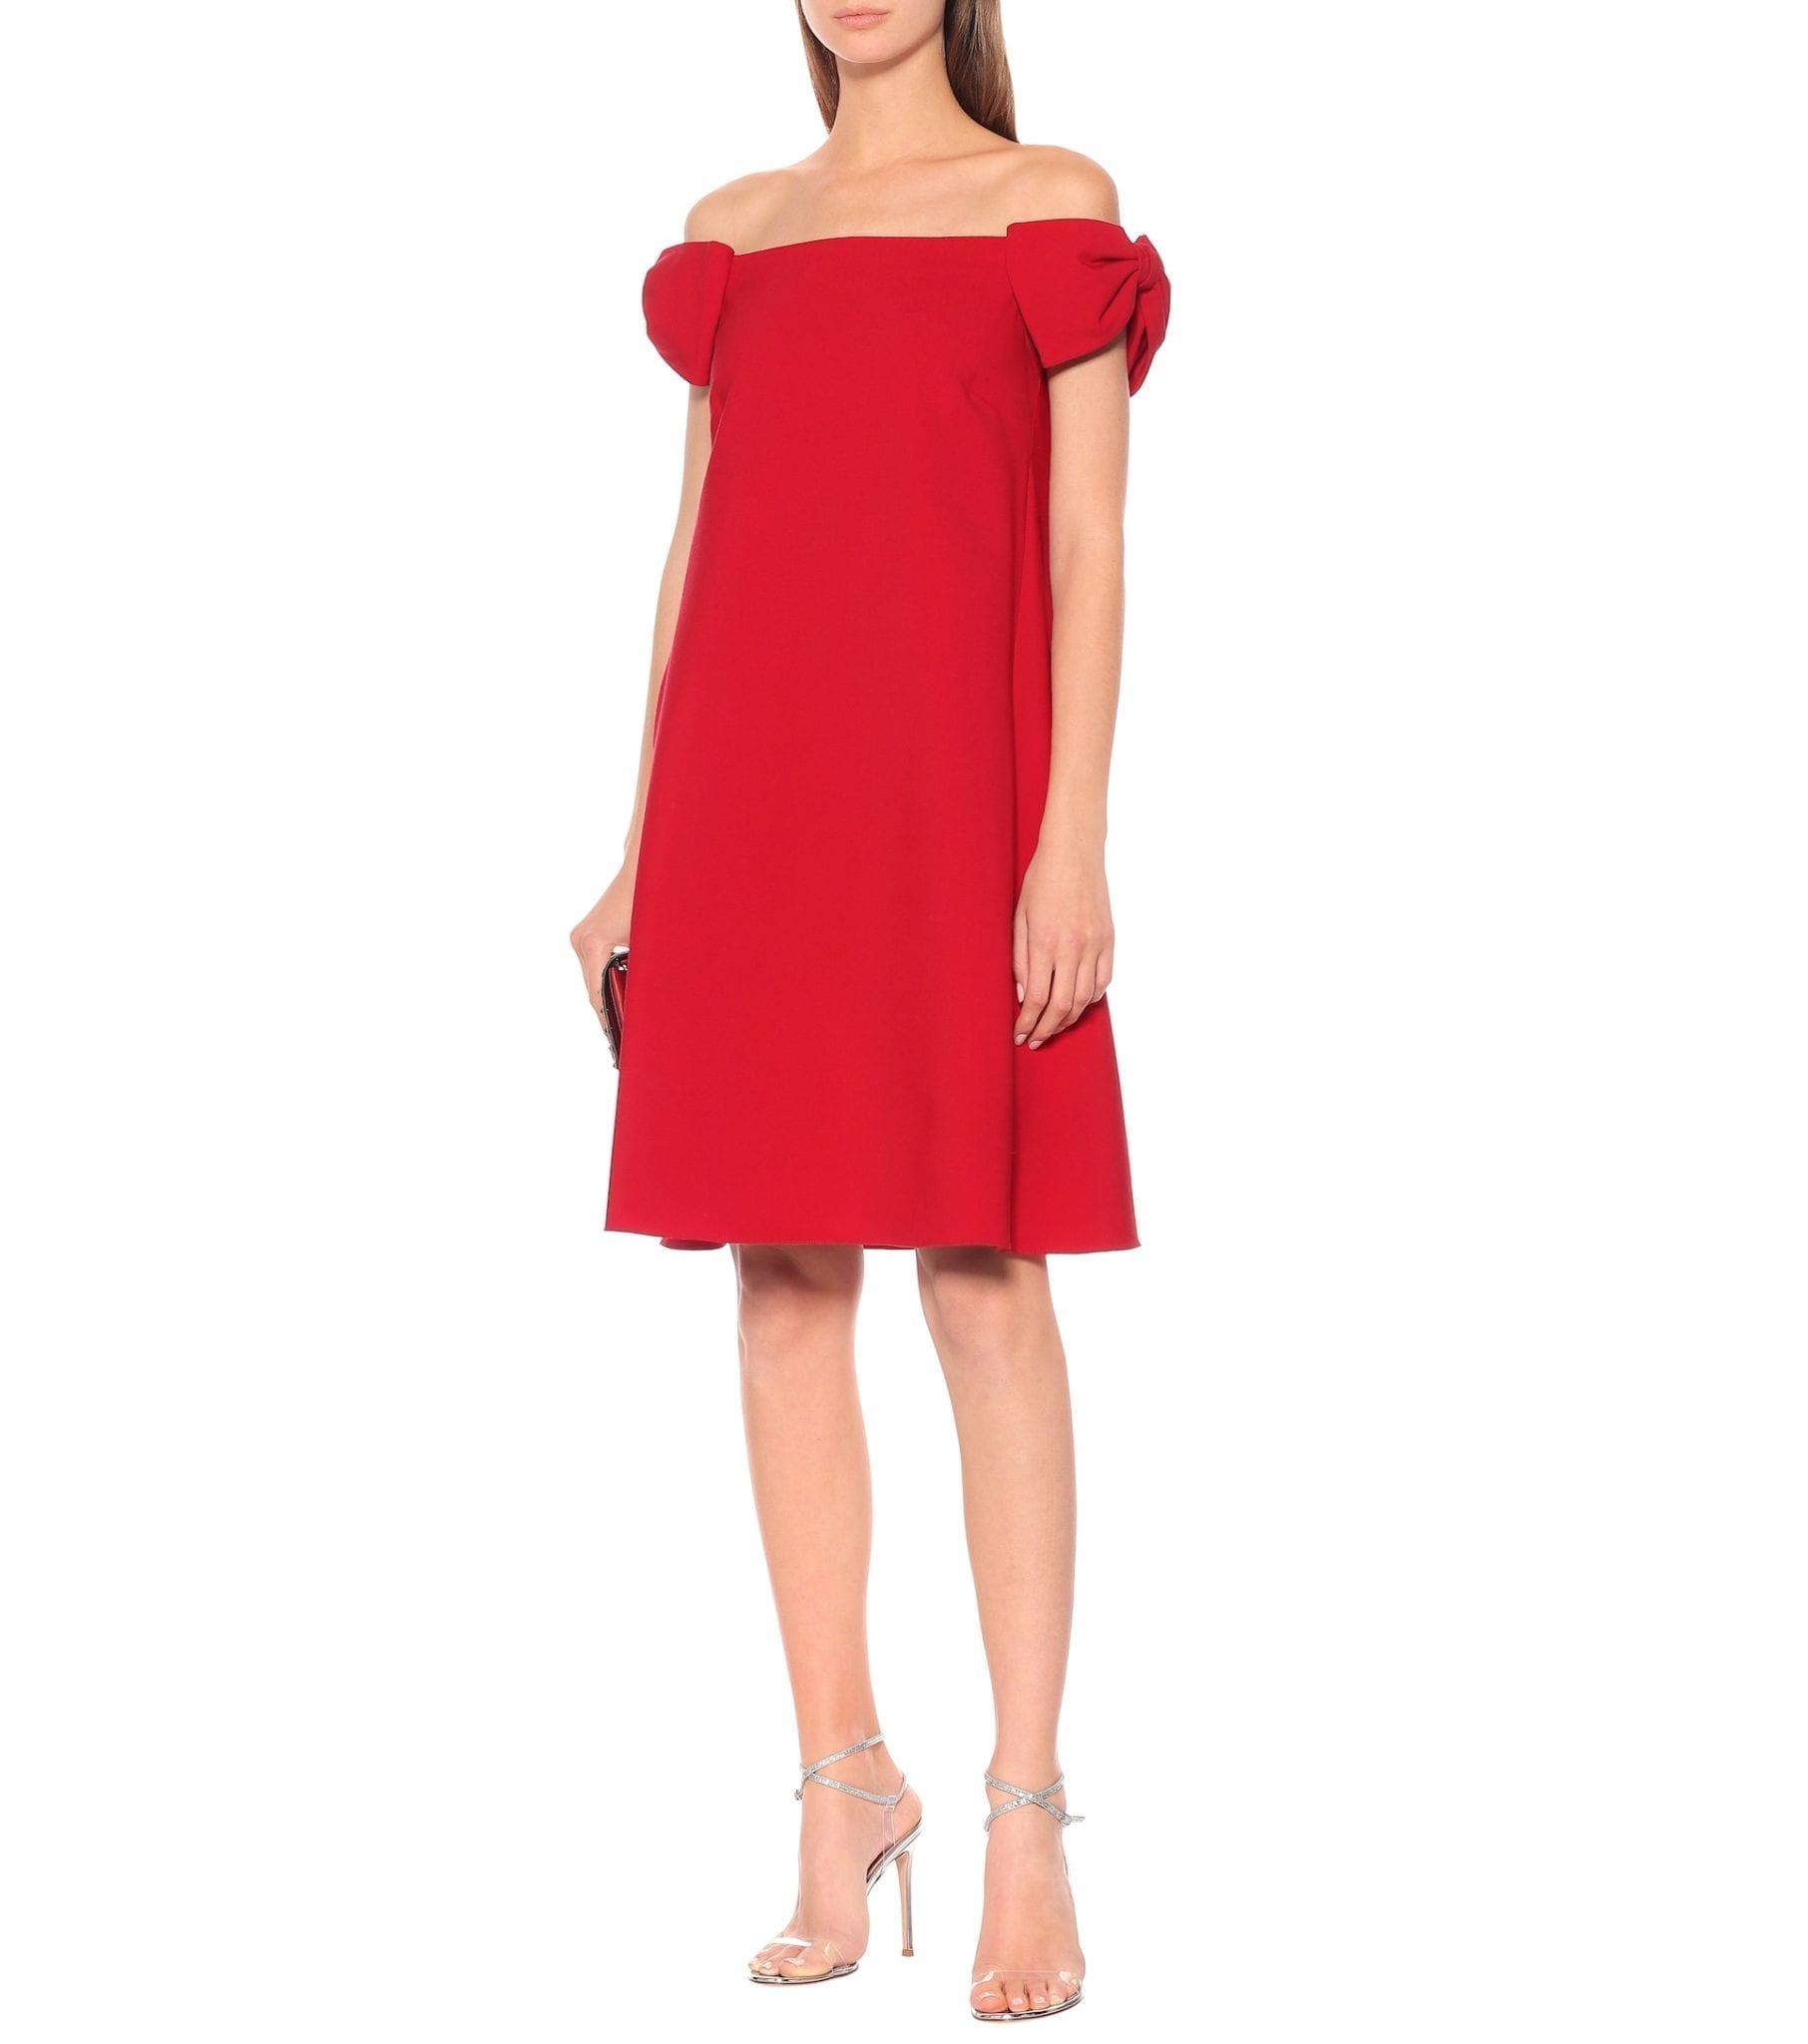 VALENTINO Wool-blend Crêpe Dress